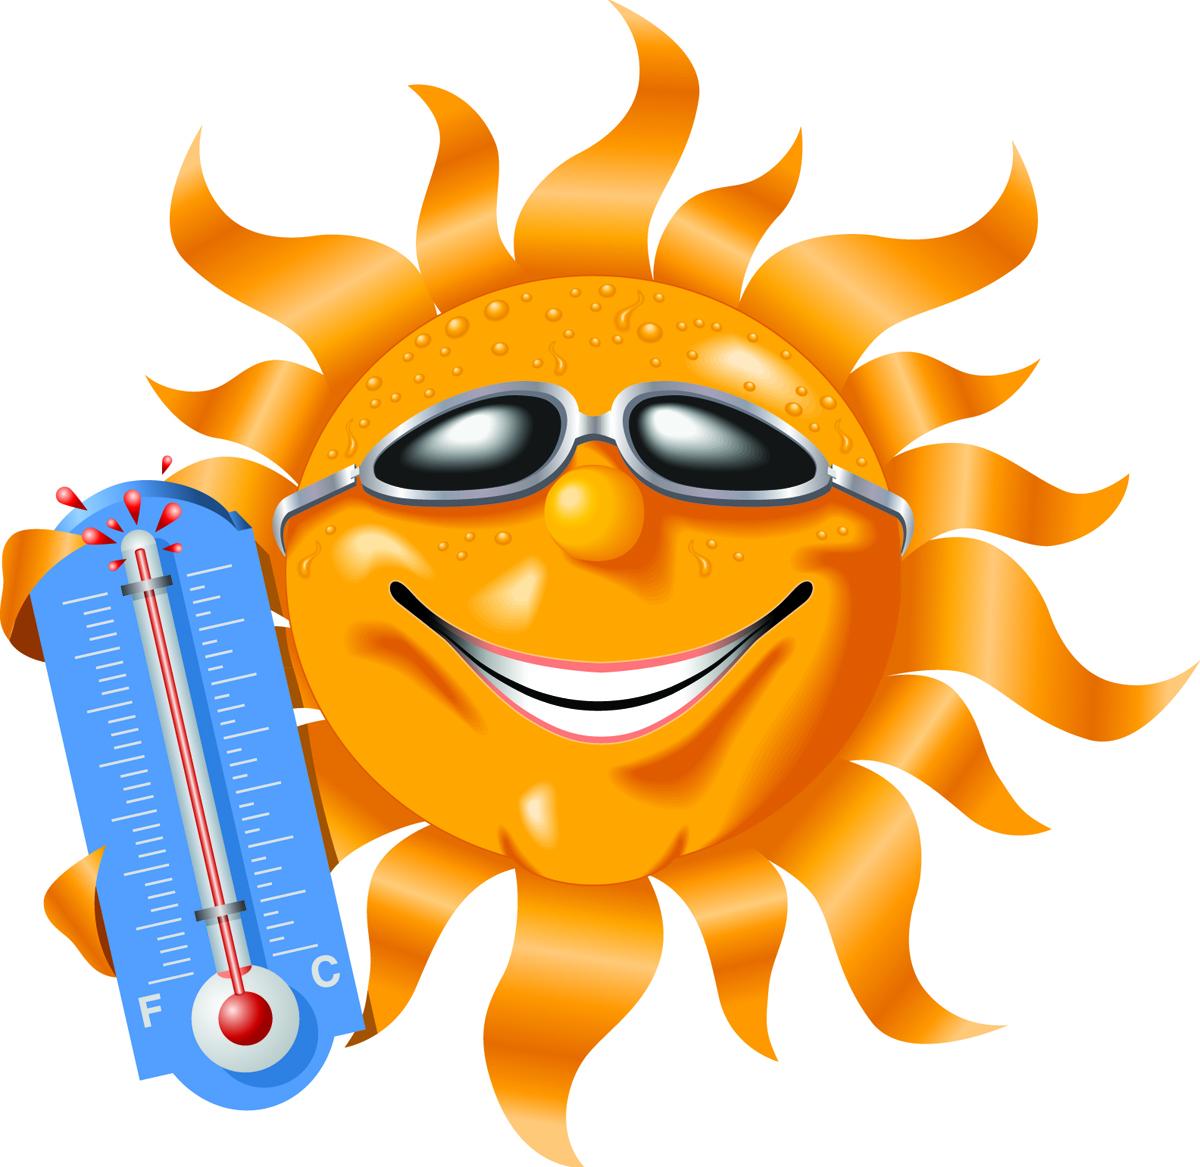 Precautions During Heat Wave